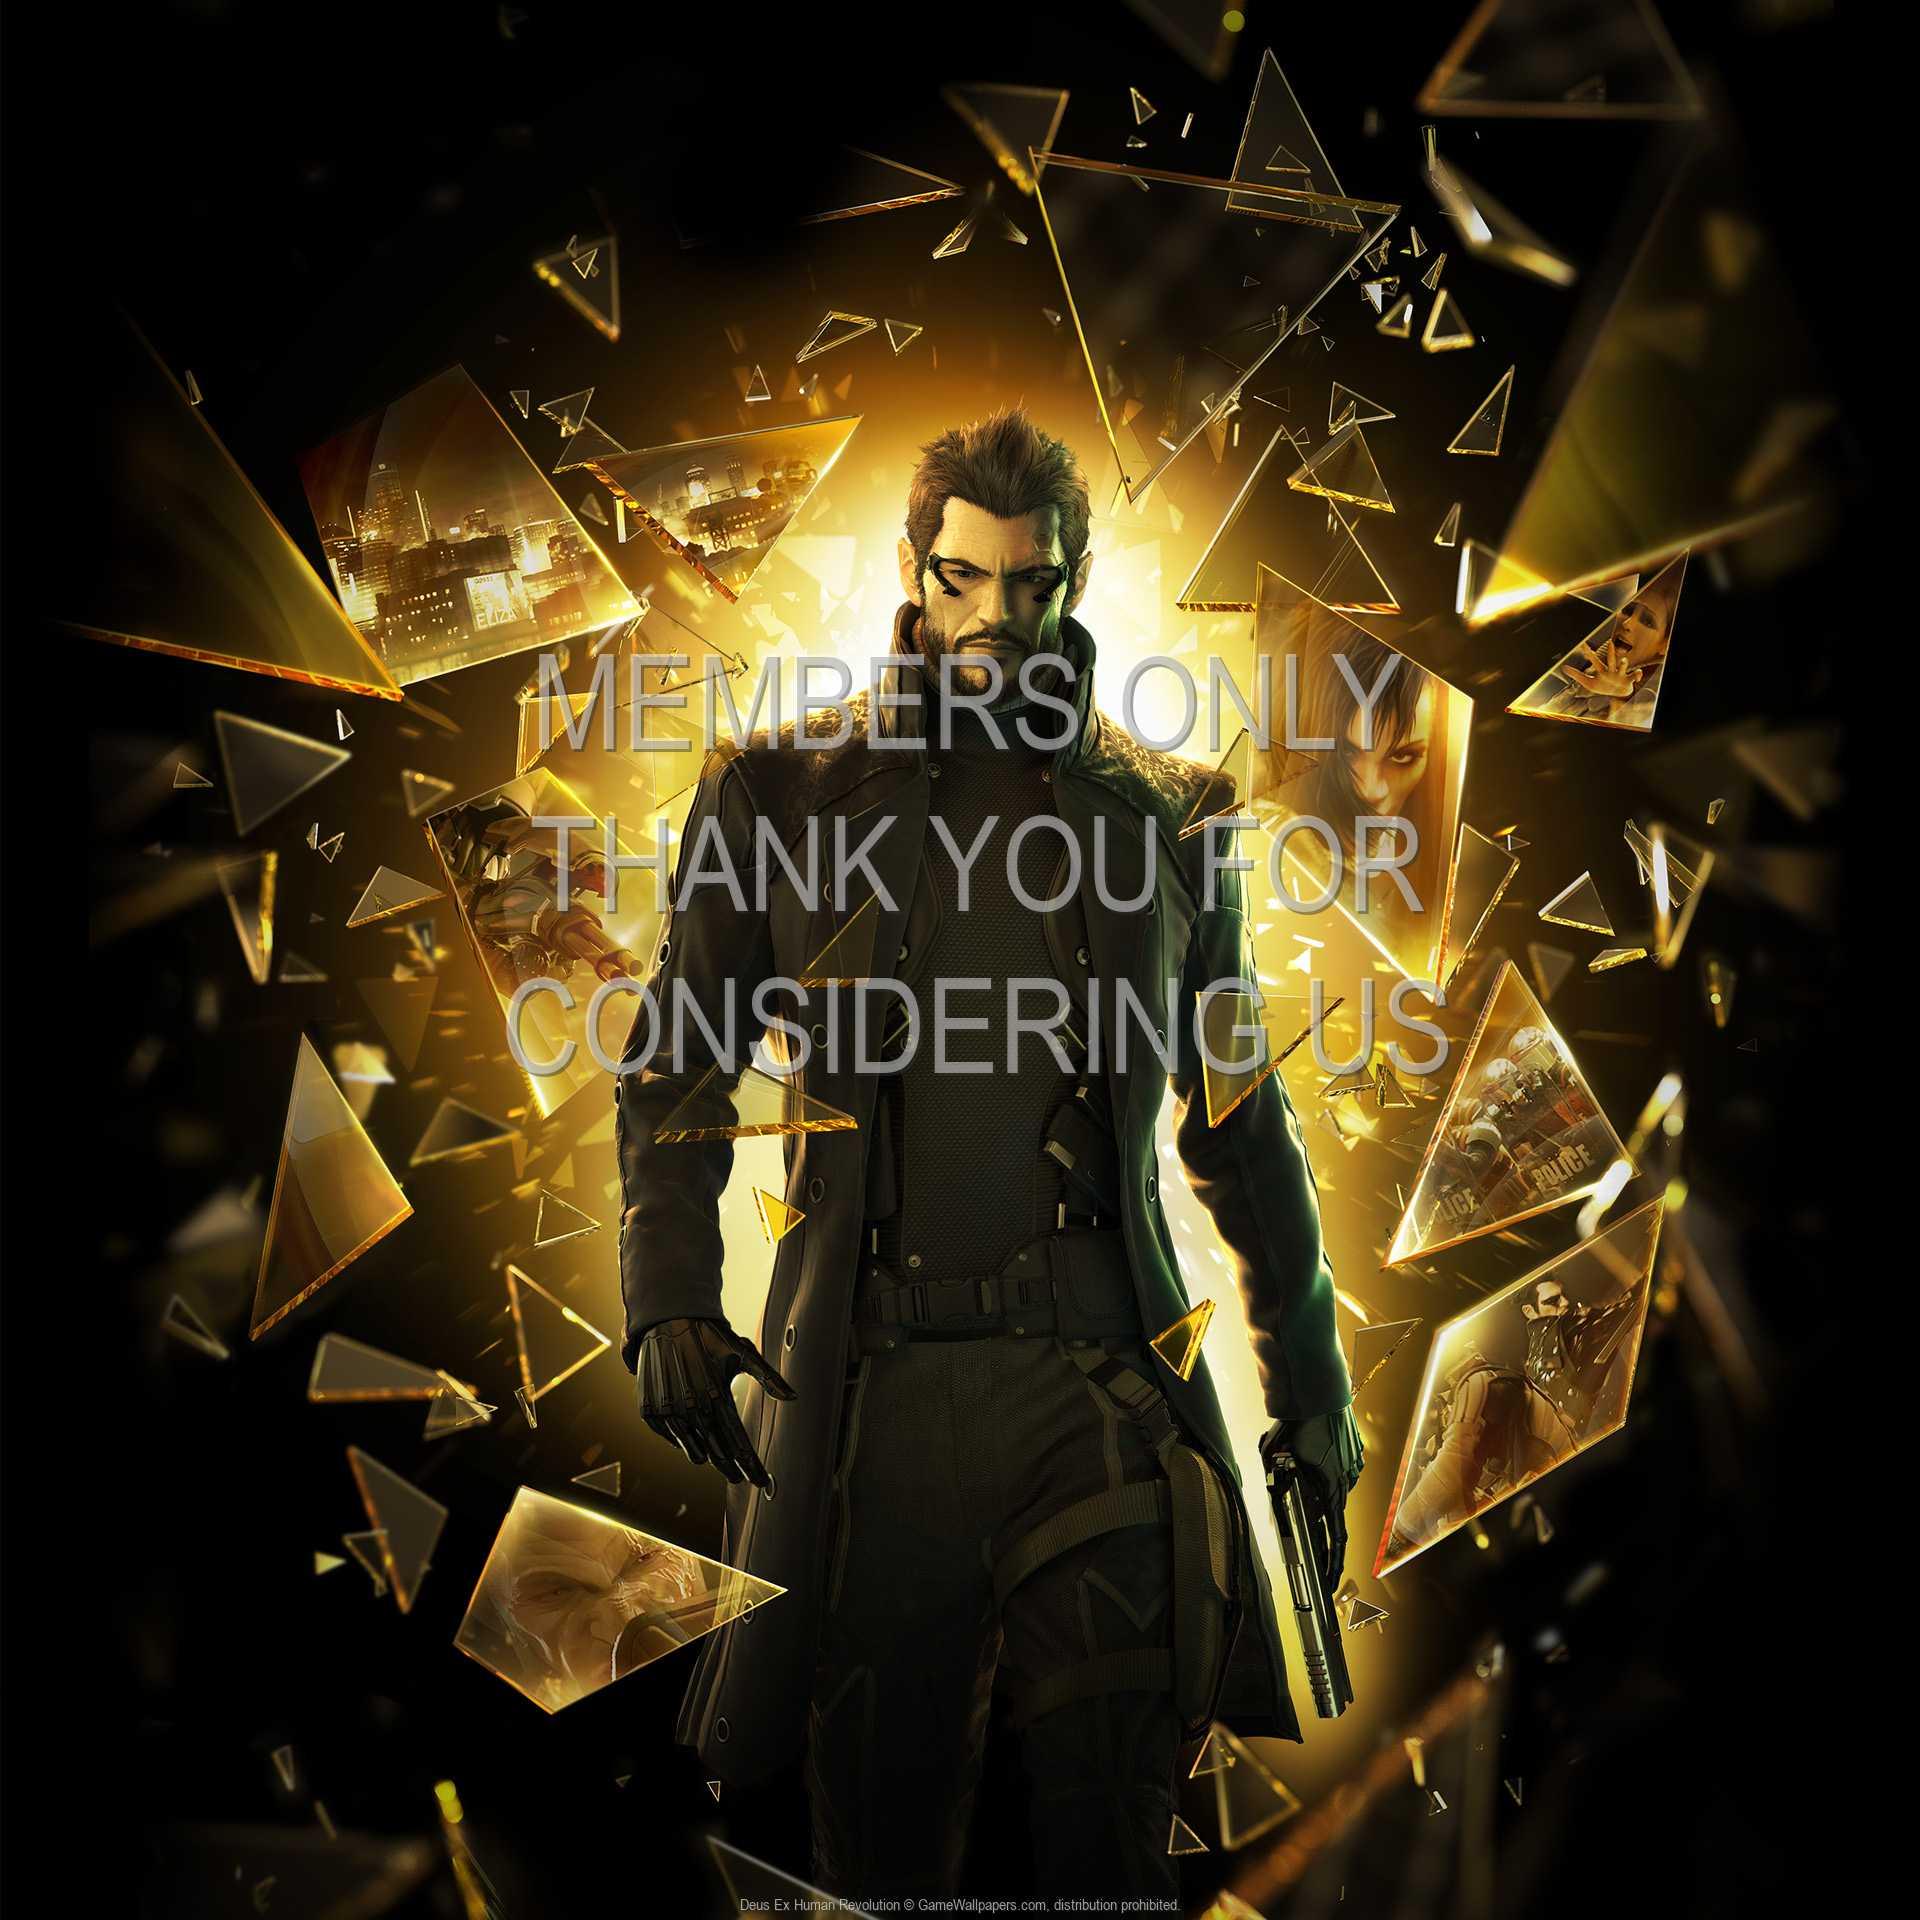 Deus Ex: Human Revolution 1080p Horizontal Handy Hintergrundbild 08